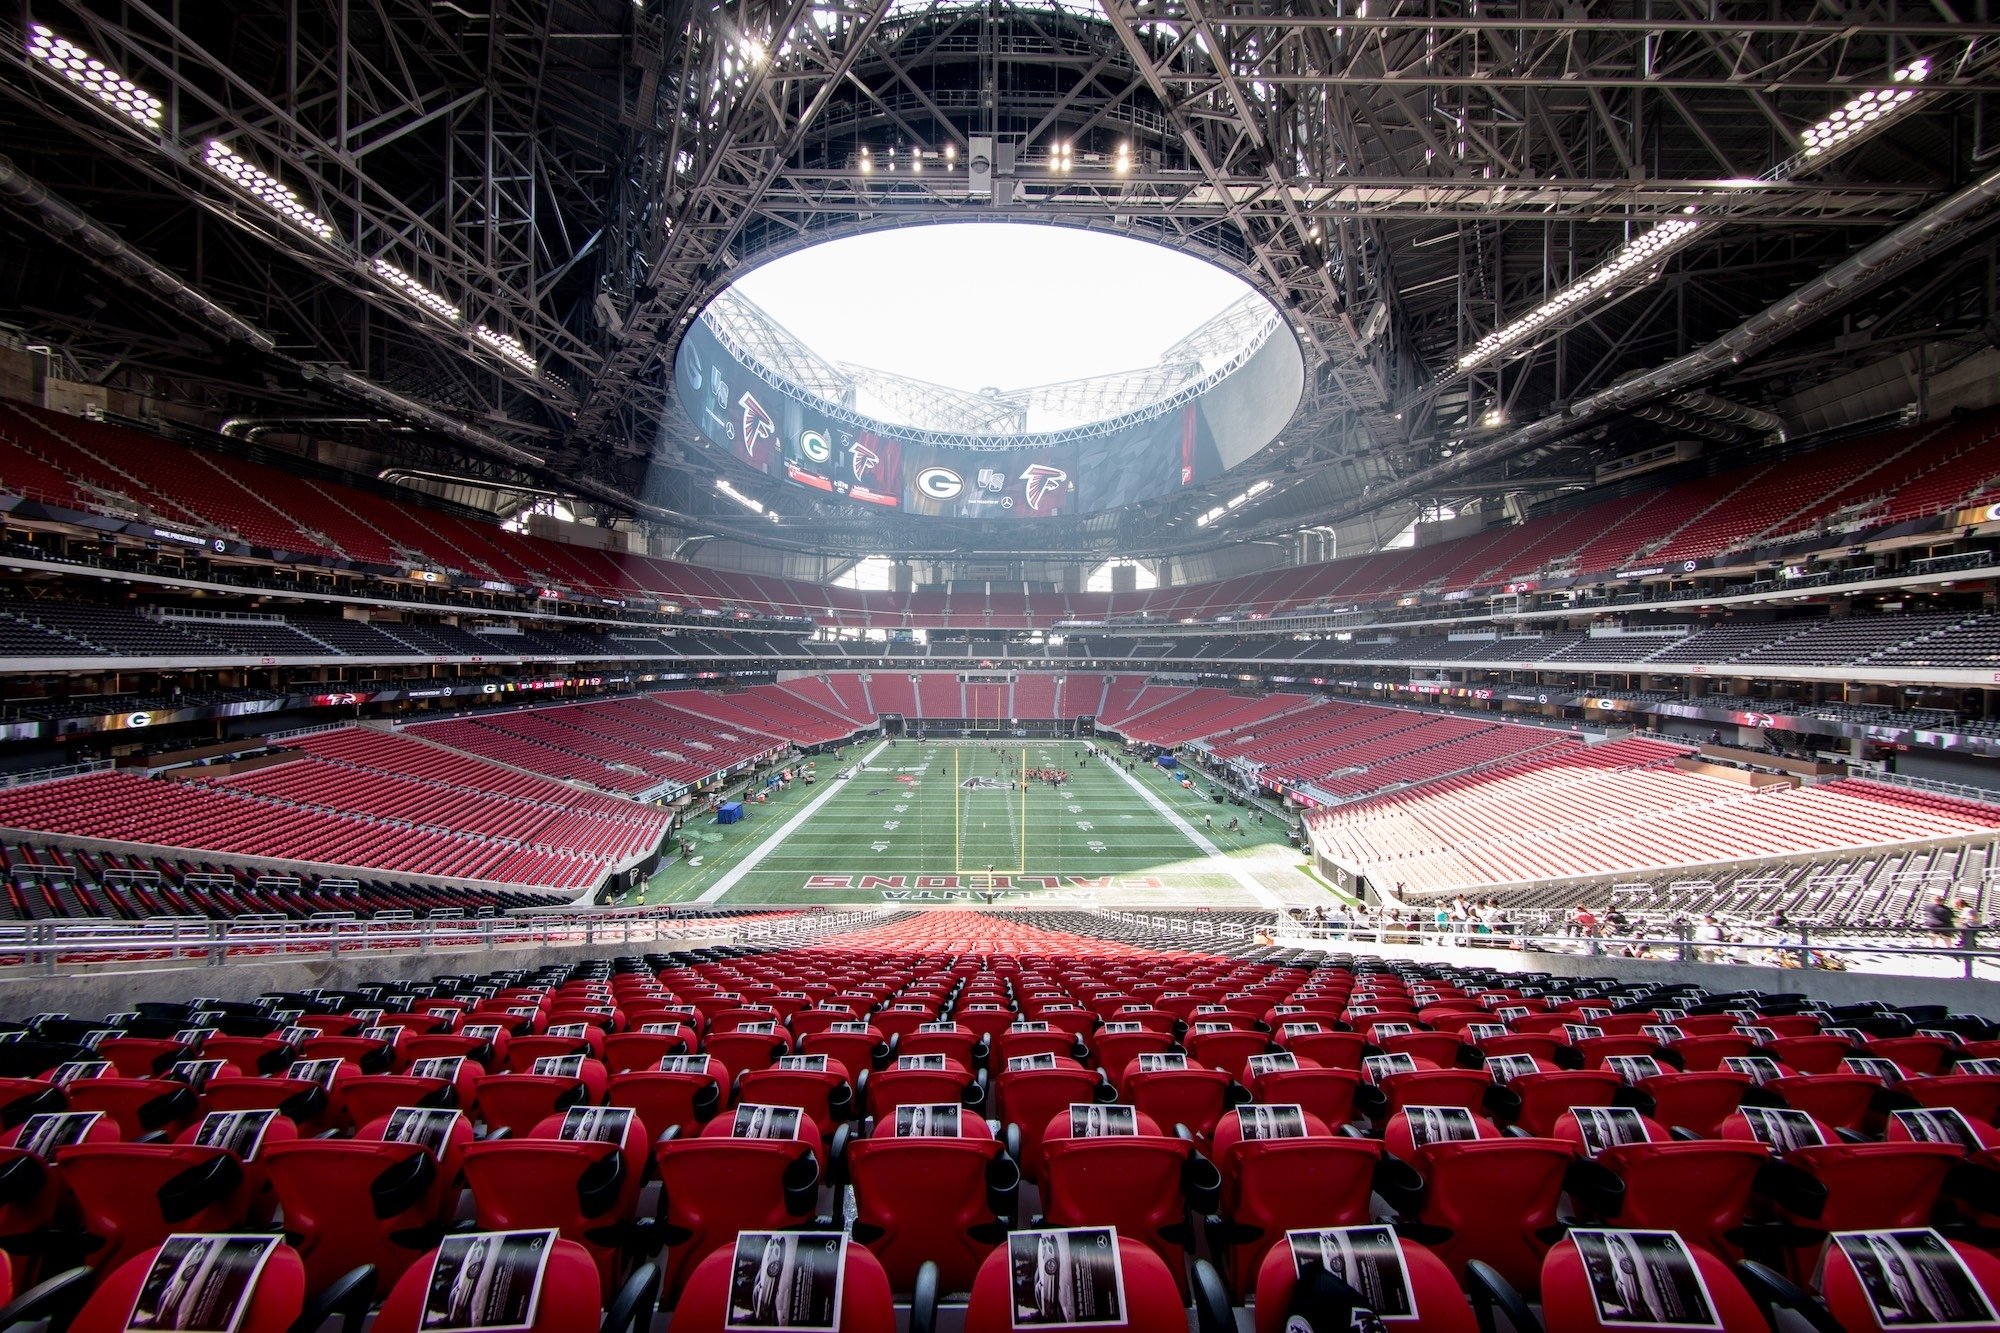 Atlanta Super Bowl Liii Host Committee Announces Official in Atlanta Super Bowl Stadium Address